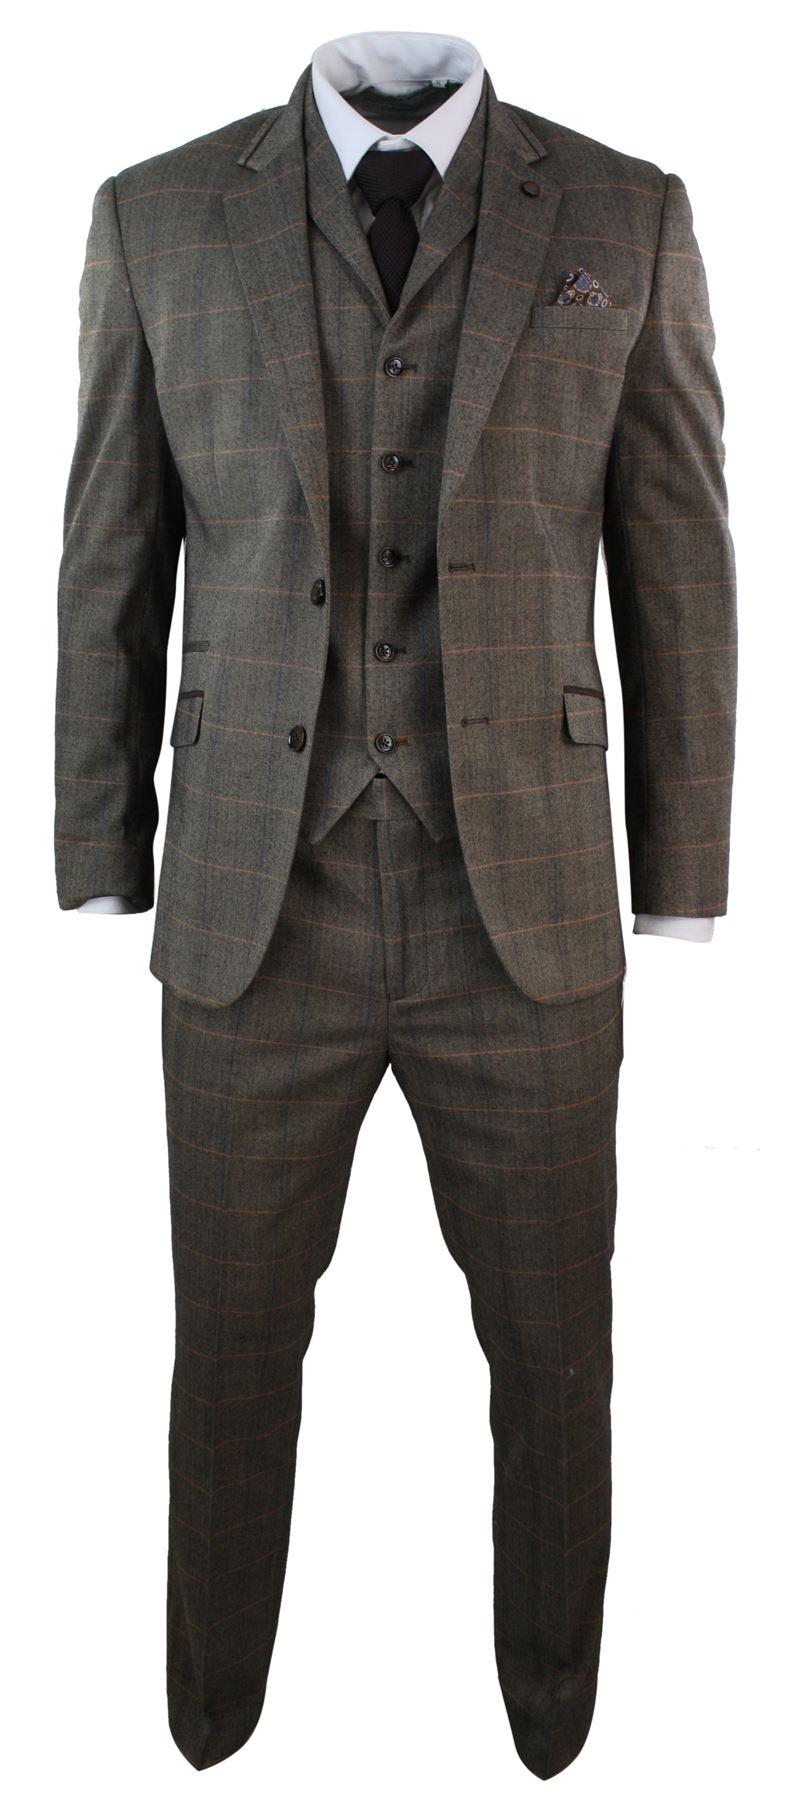 Costume-homme-3-pieces-tweed-a-carreaux-marron-coupe-cintree-vintage-empiecement